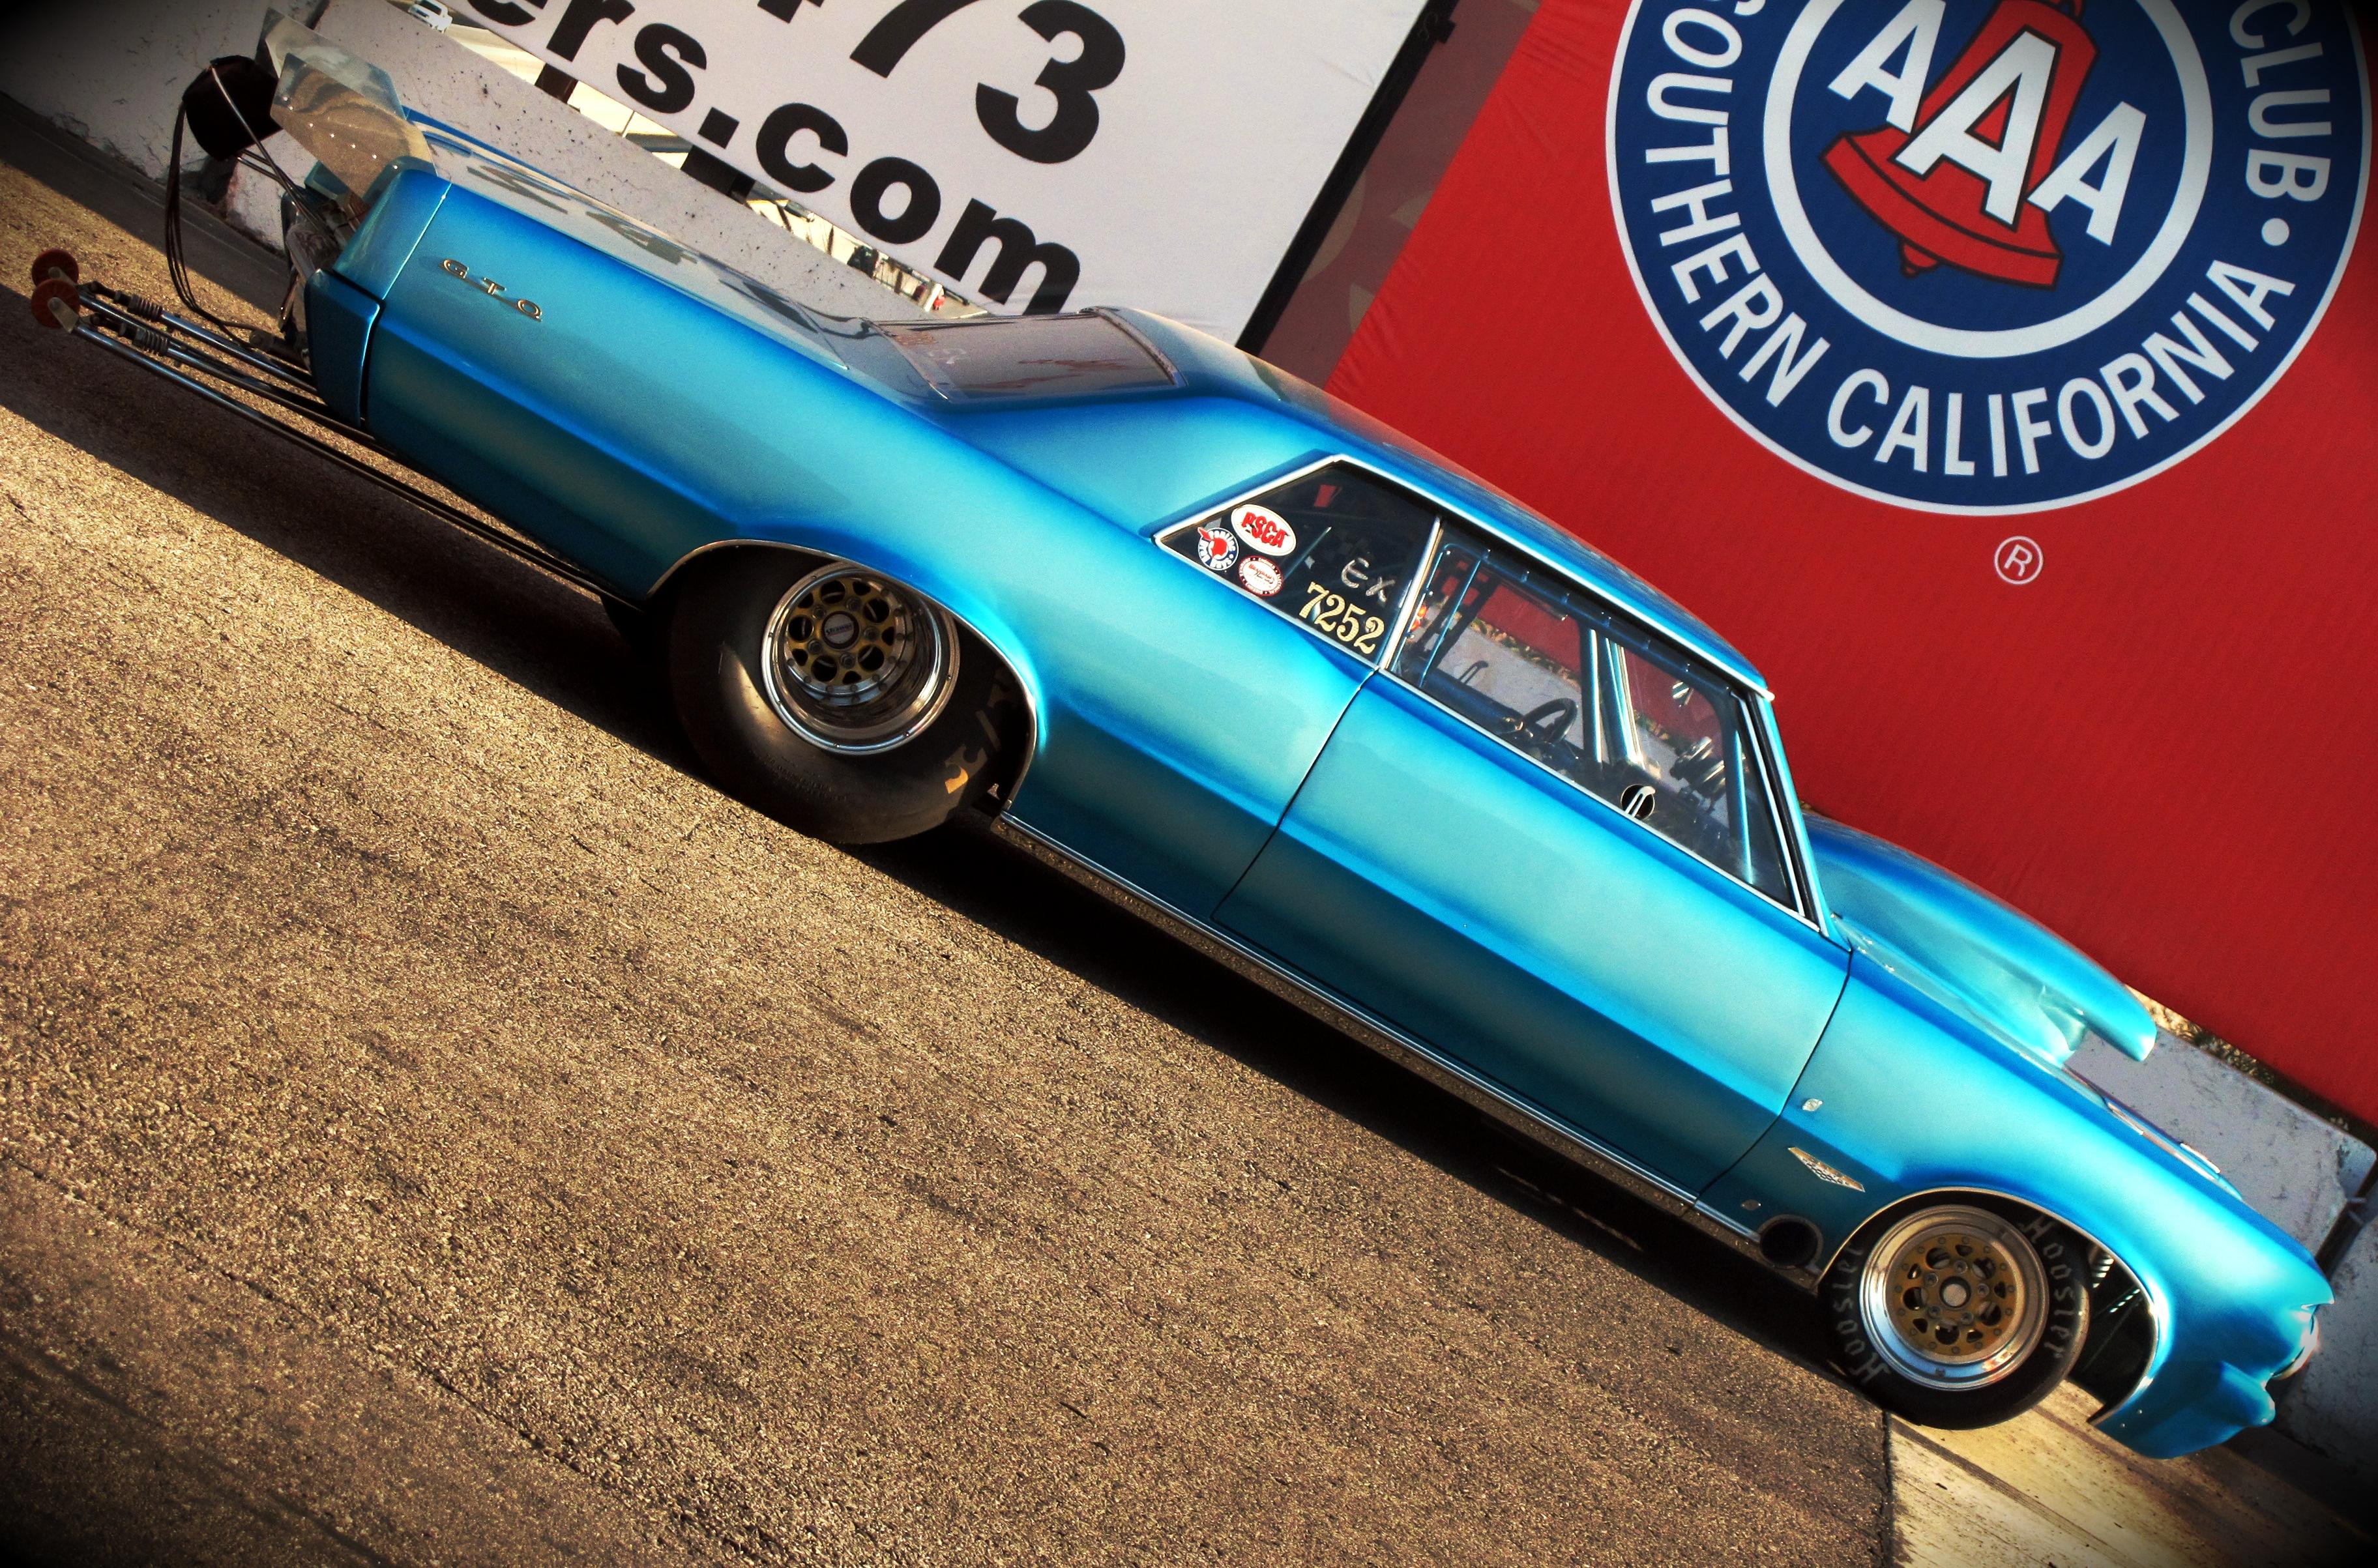 1964 Pontiac GTO Drag Racer, drag racing, drag race, irwindale speedway, irwindale raceway